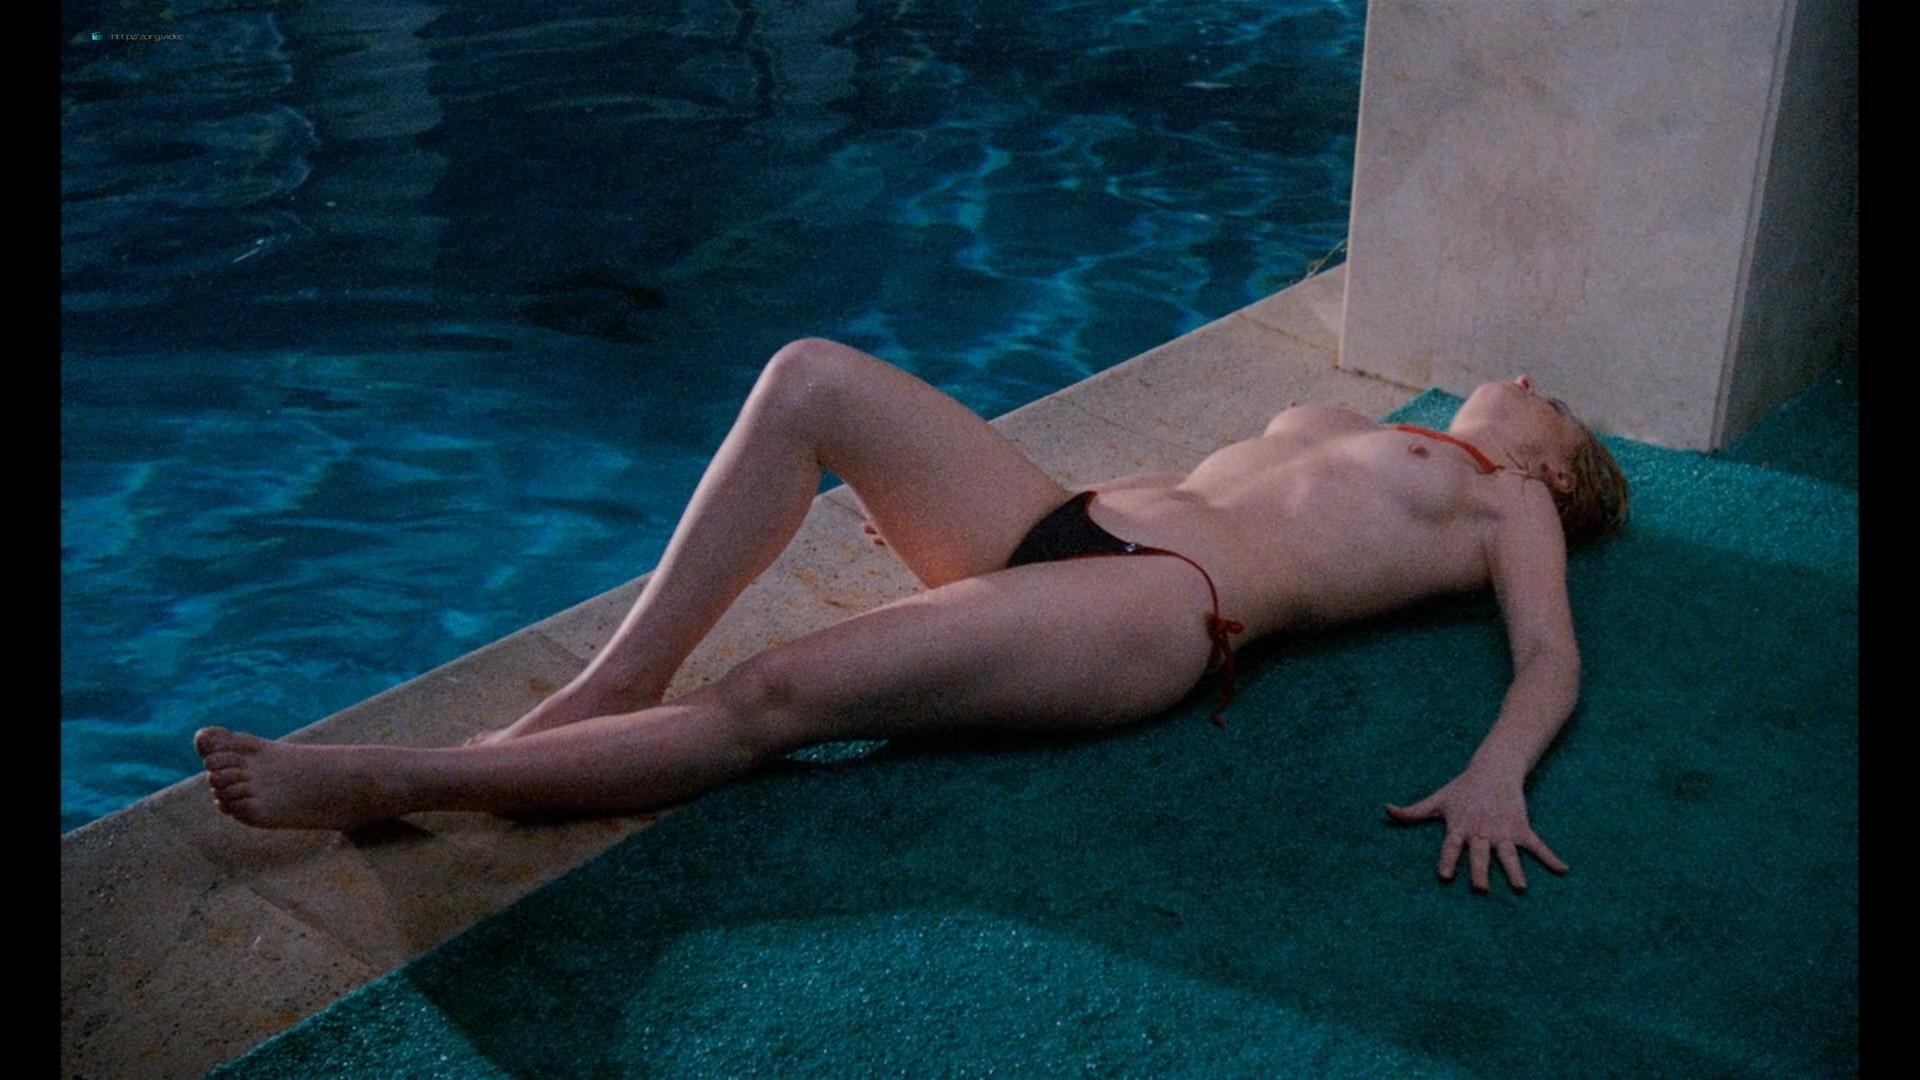 Roxana Nieto nude Leticia Marfil and Pilar Alcón all nude bush topless - Pieces (1982) HD 1080p BluRay (15)